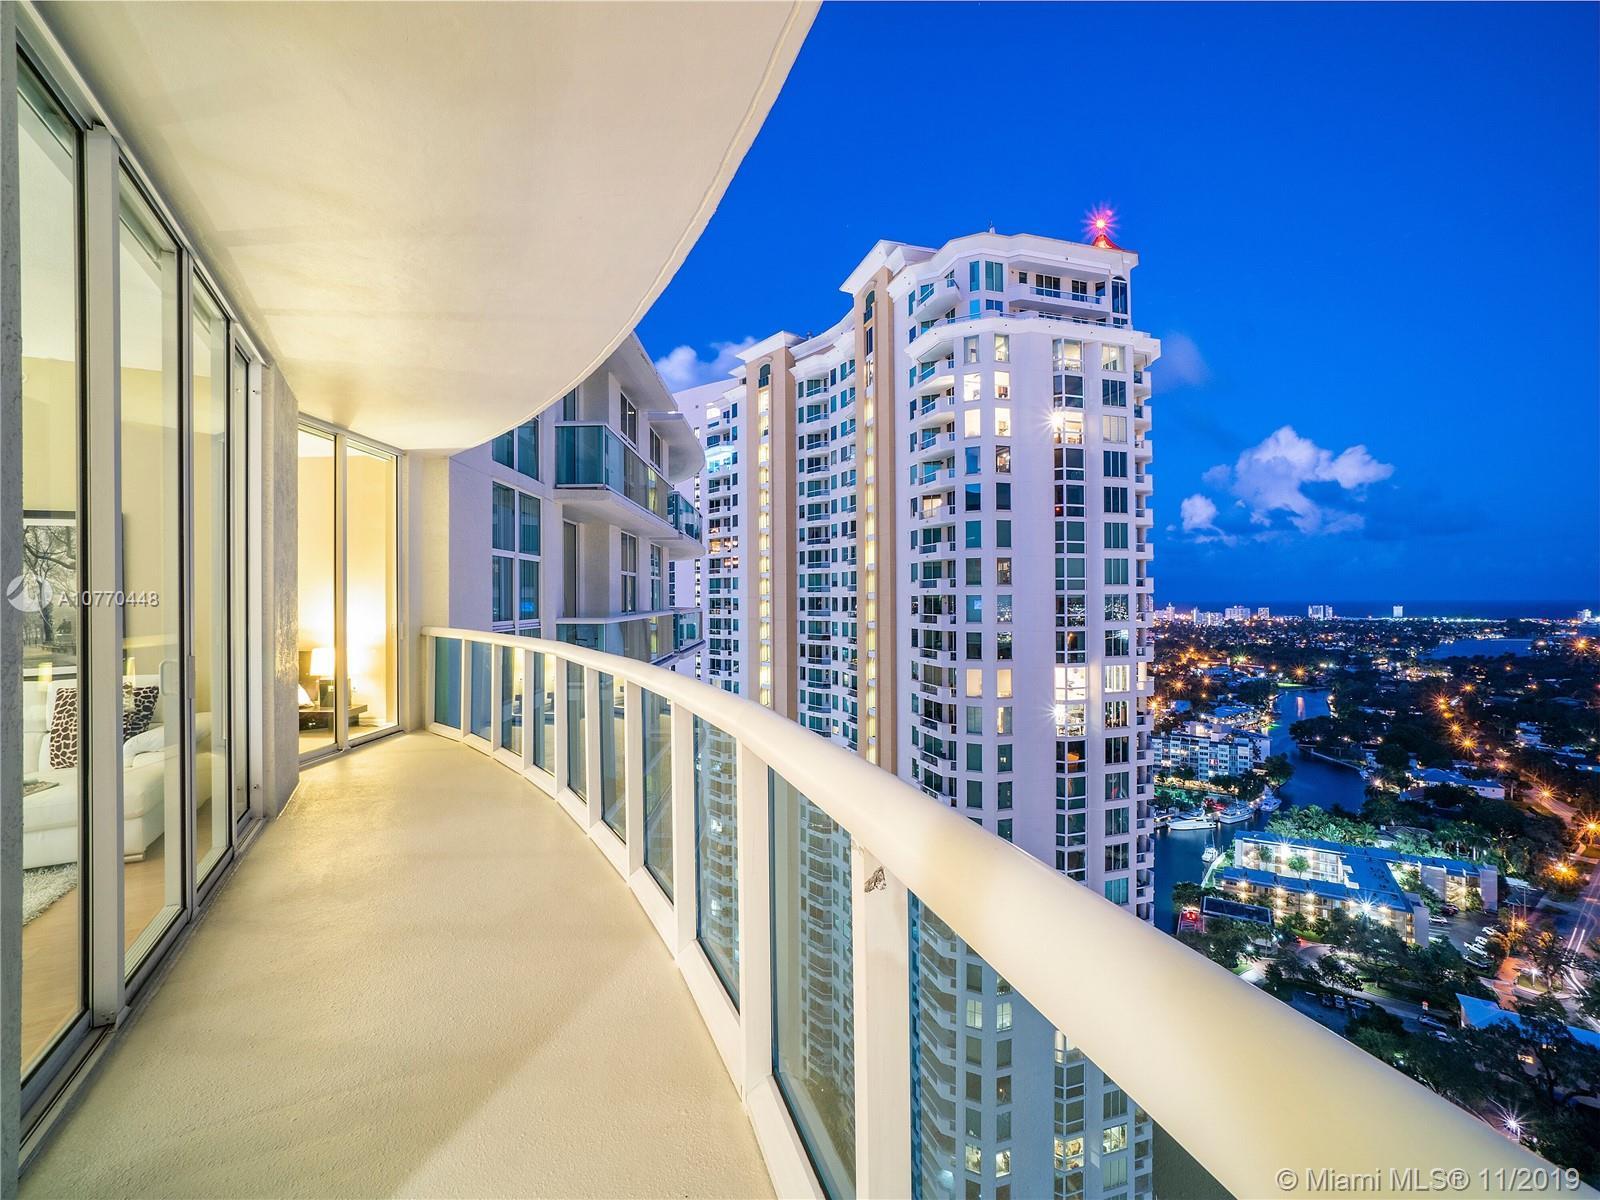 347 N New River Dr E 3101, Fort Lauderdale, FL 33301